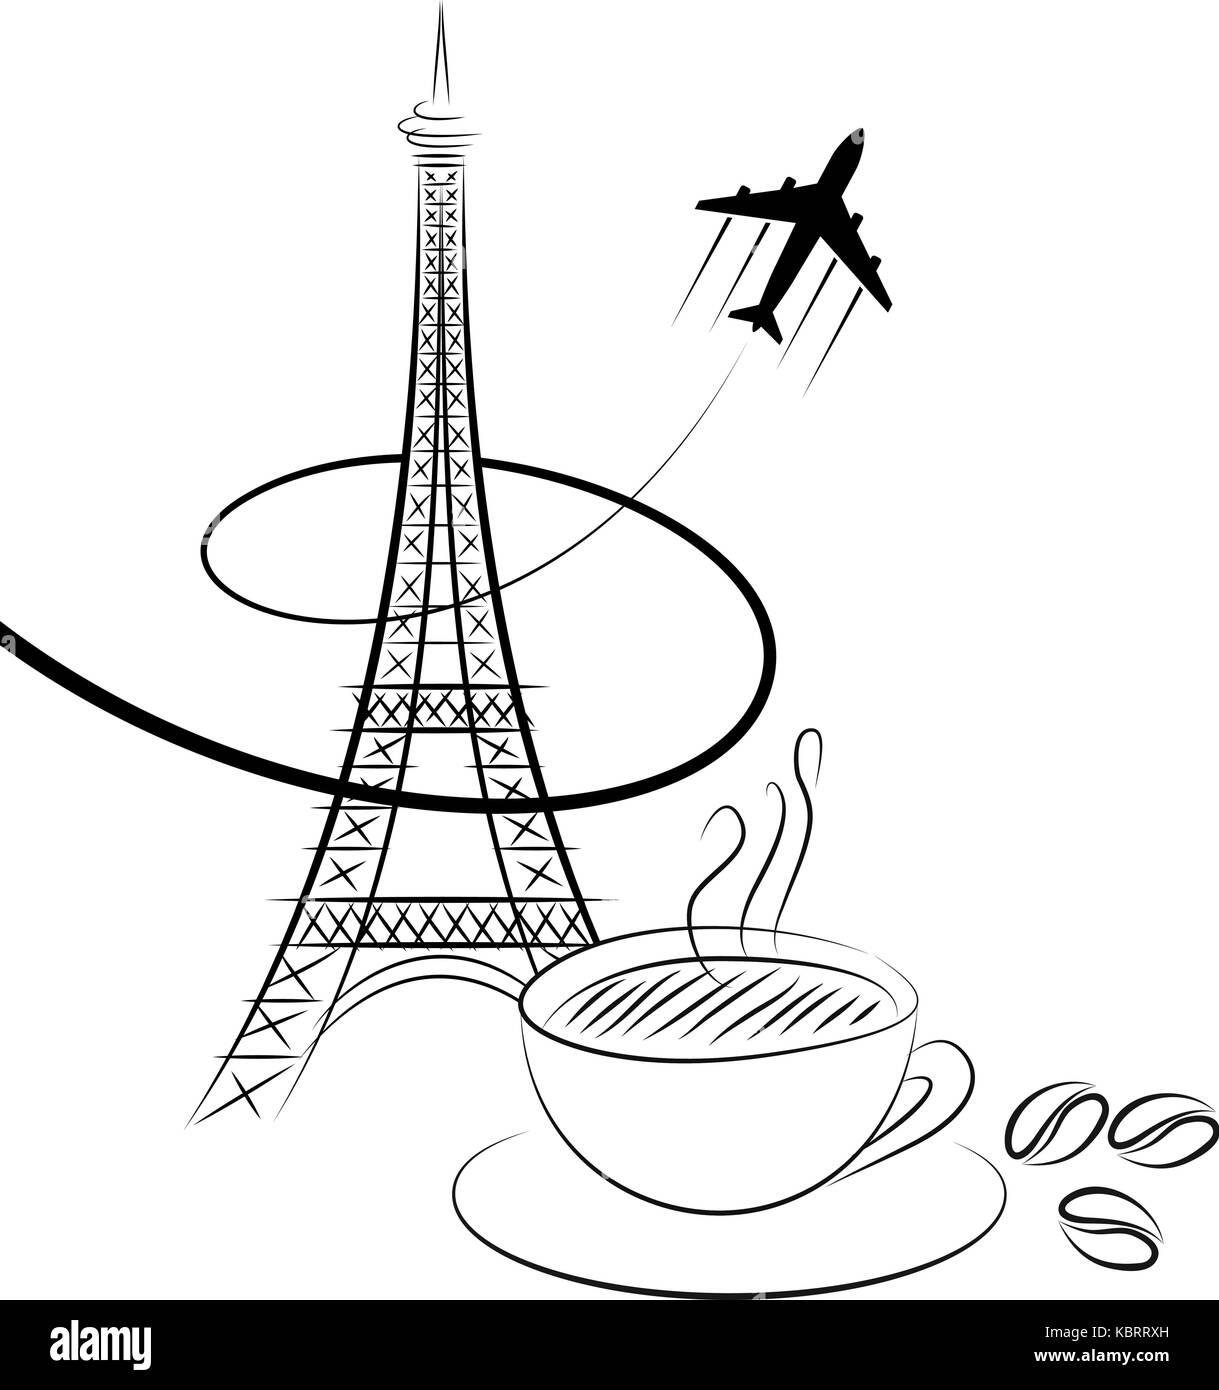 Eiffel Tower Vector Sketch Stockfotos & Eiffel Tower Vector Sketch ...